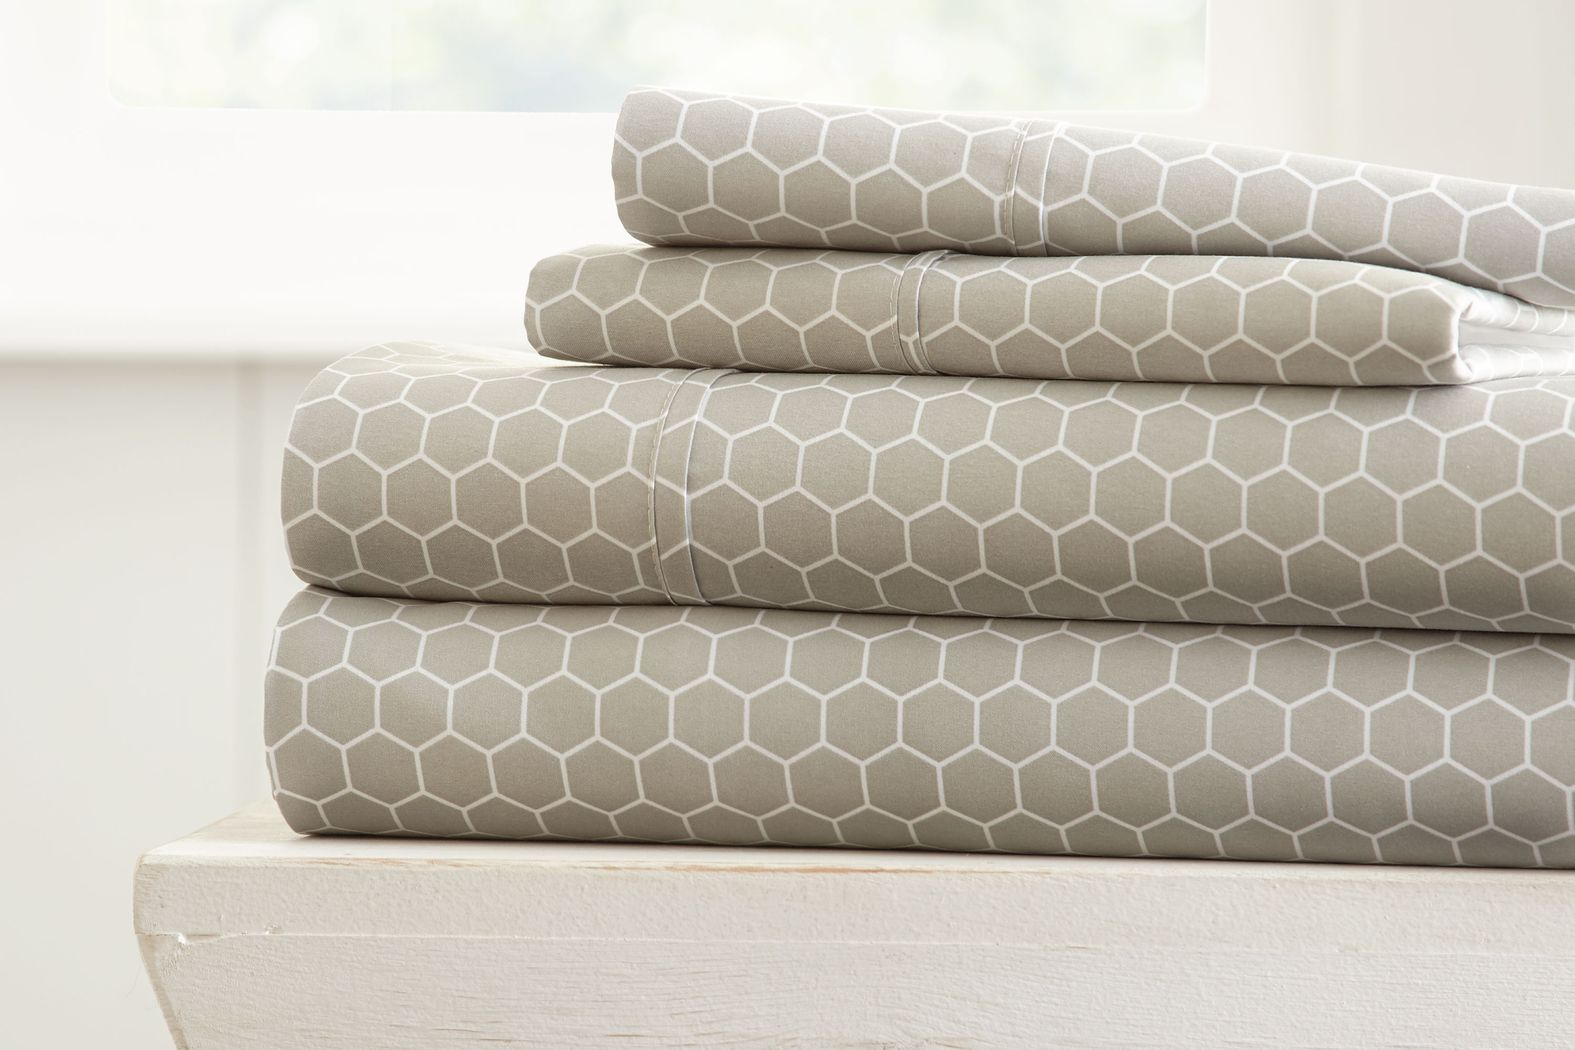 Belden Landing X Light Gray 4 Pc King Bed Sheet Set